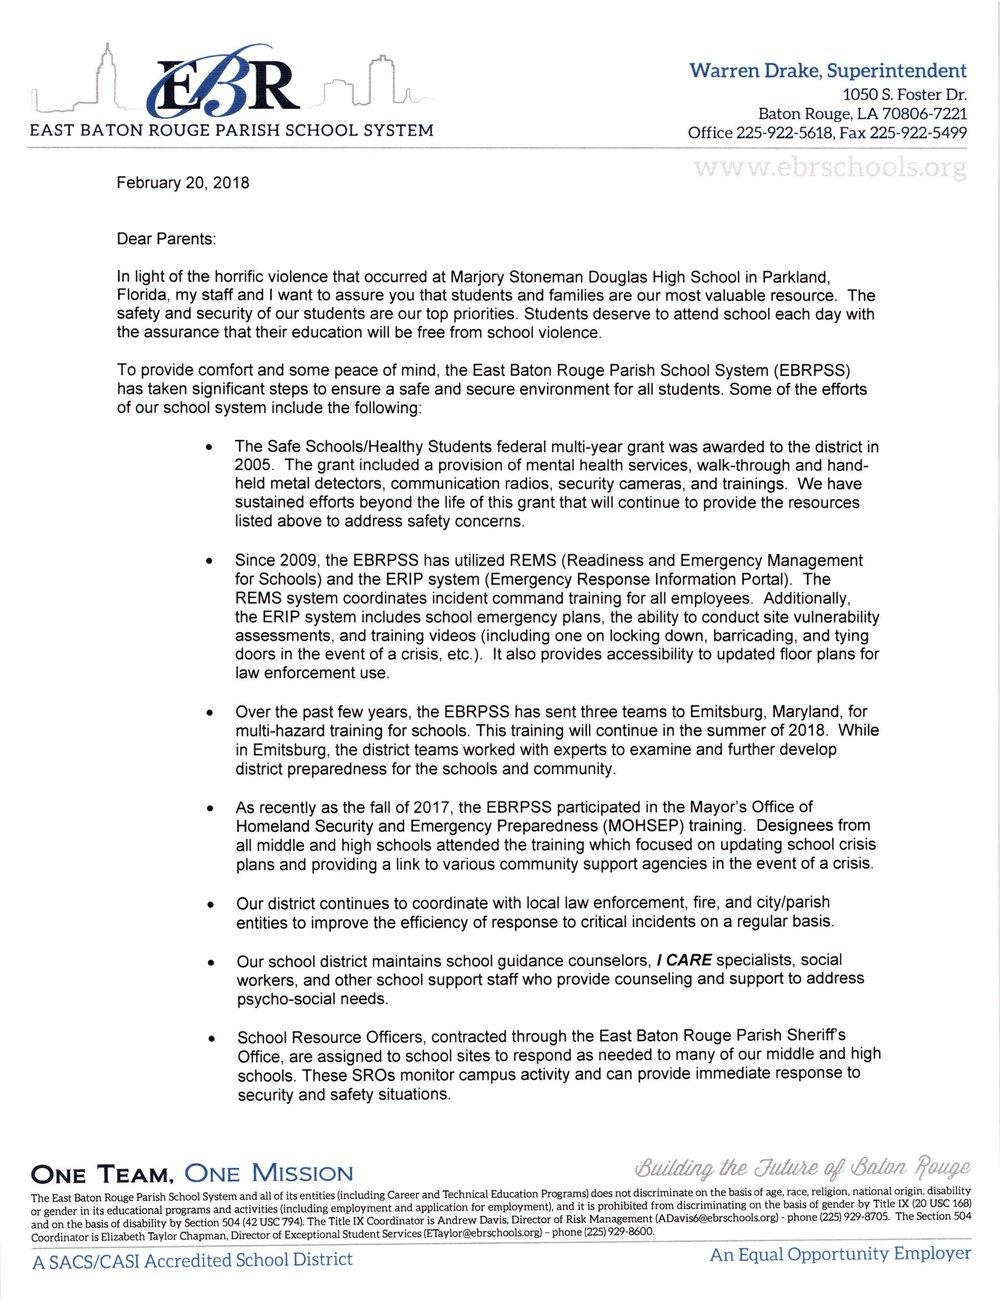 EBRPSS_SafetyLetter_030118_Page_1.jpg